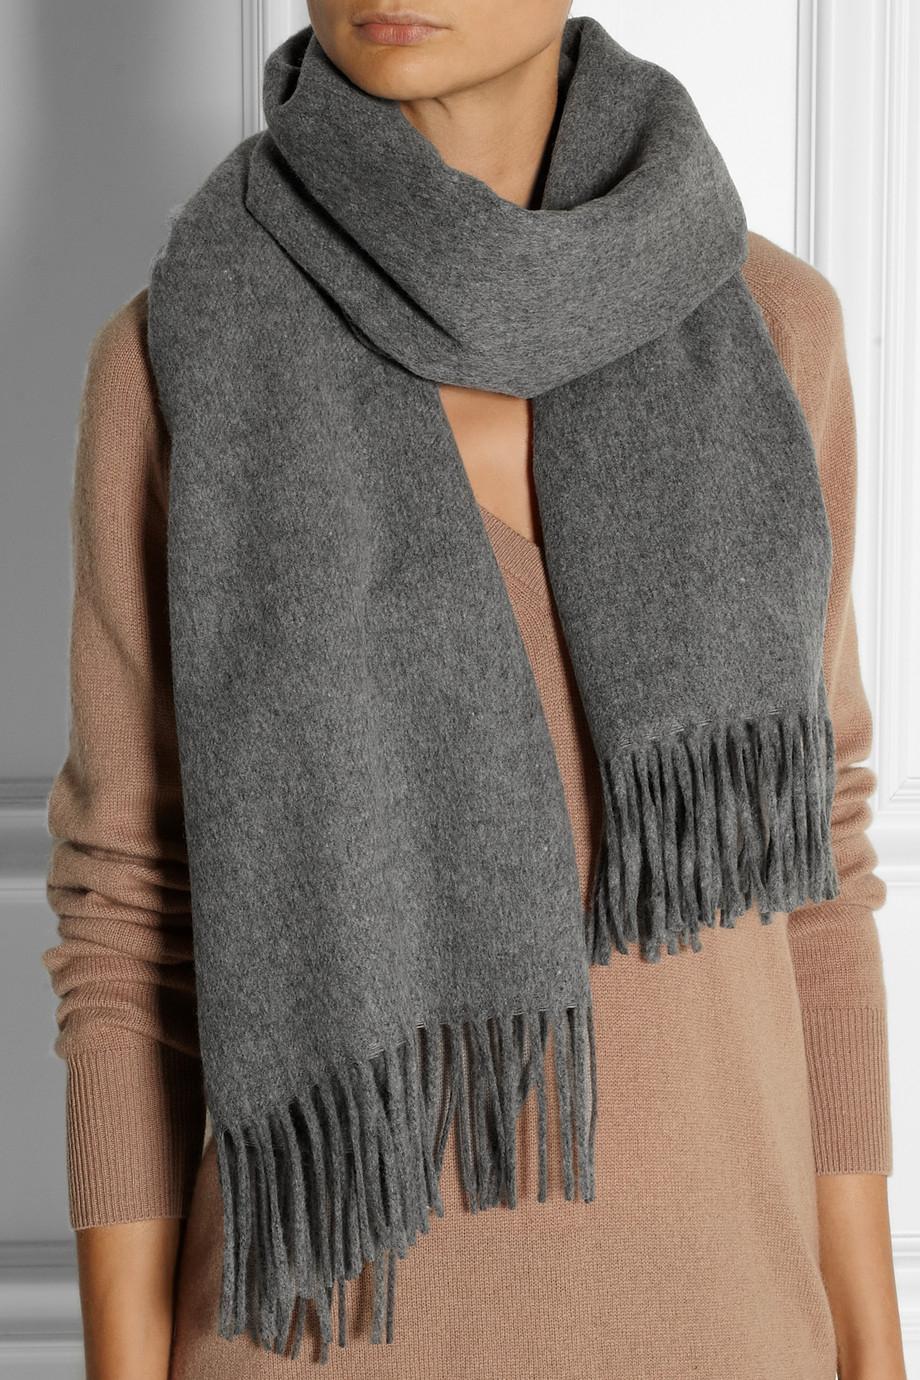 Canada Fringed Wool Scarf - Gray Acne Studios 7s9Ikf